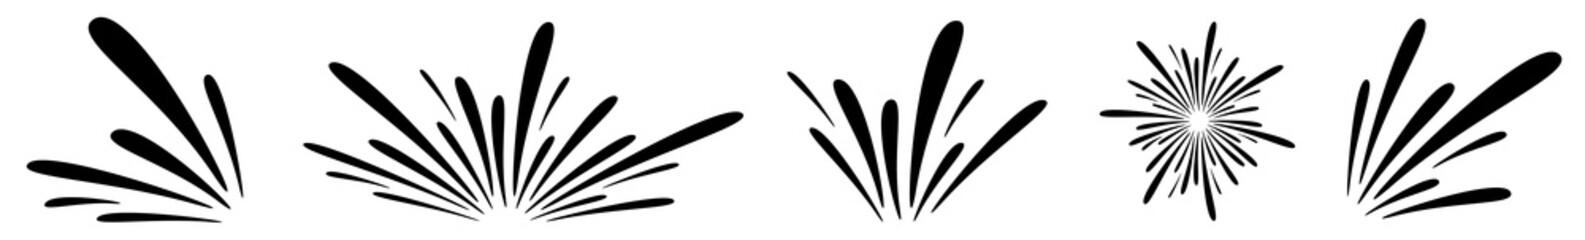 Water Splash Icon Black   Splashes   Droplets Symbol   Splashing Logo   Liquid Motion Sign   Isolated   Variations Fototapete